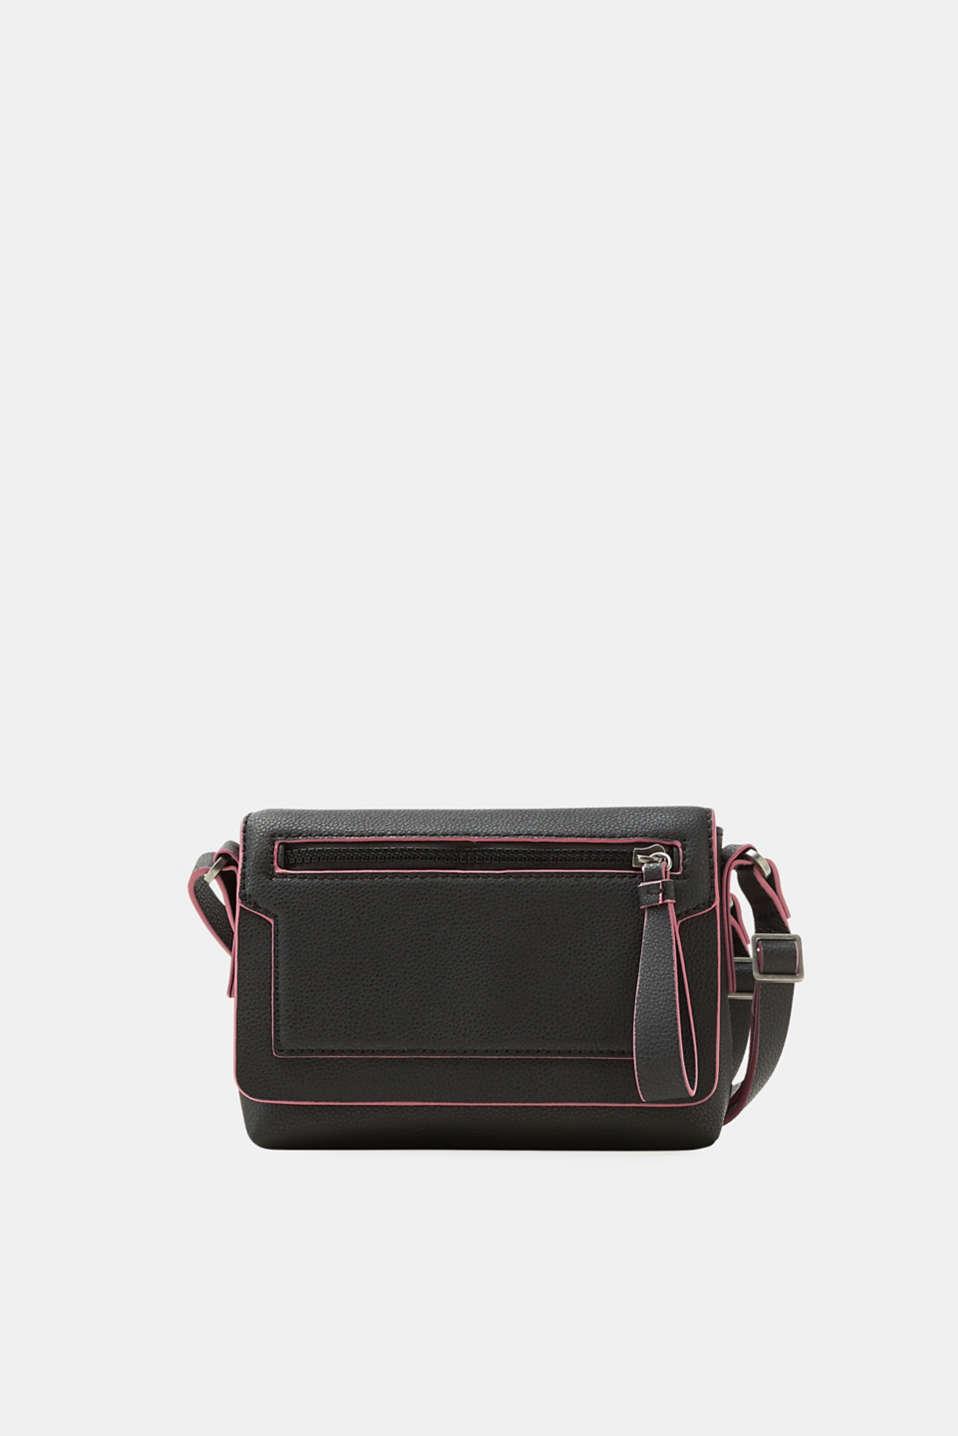 4249861d72 edc - Small faux leather shoulder bag at our Online Shop